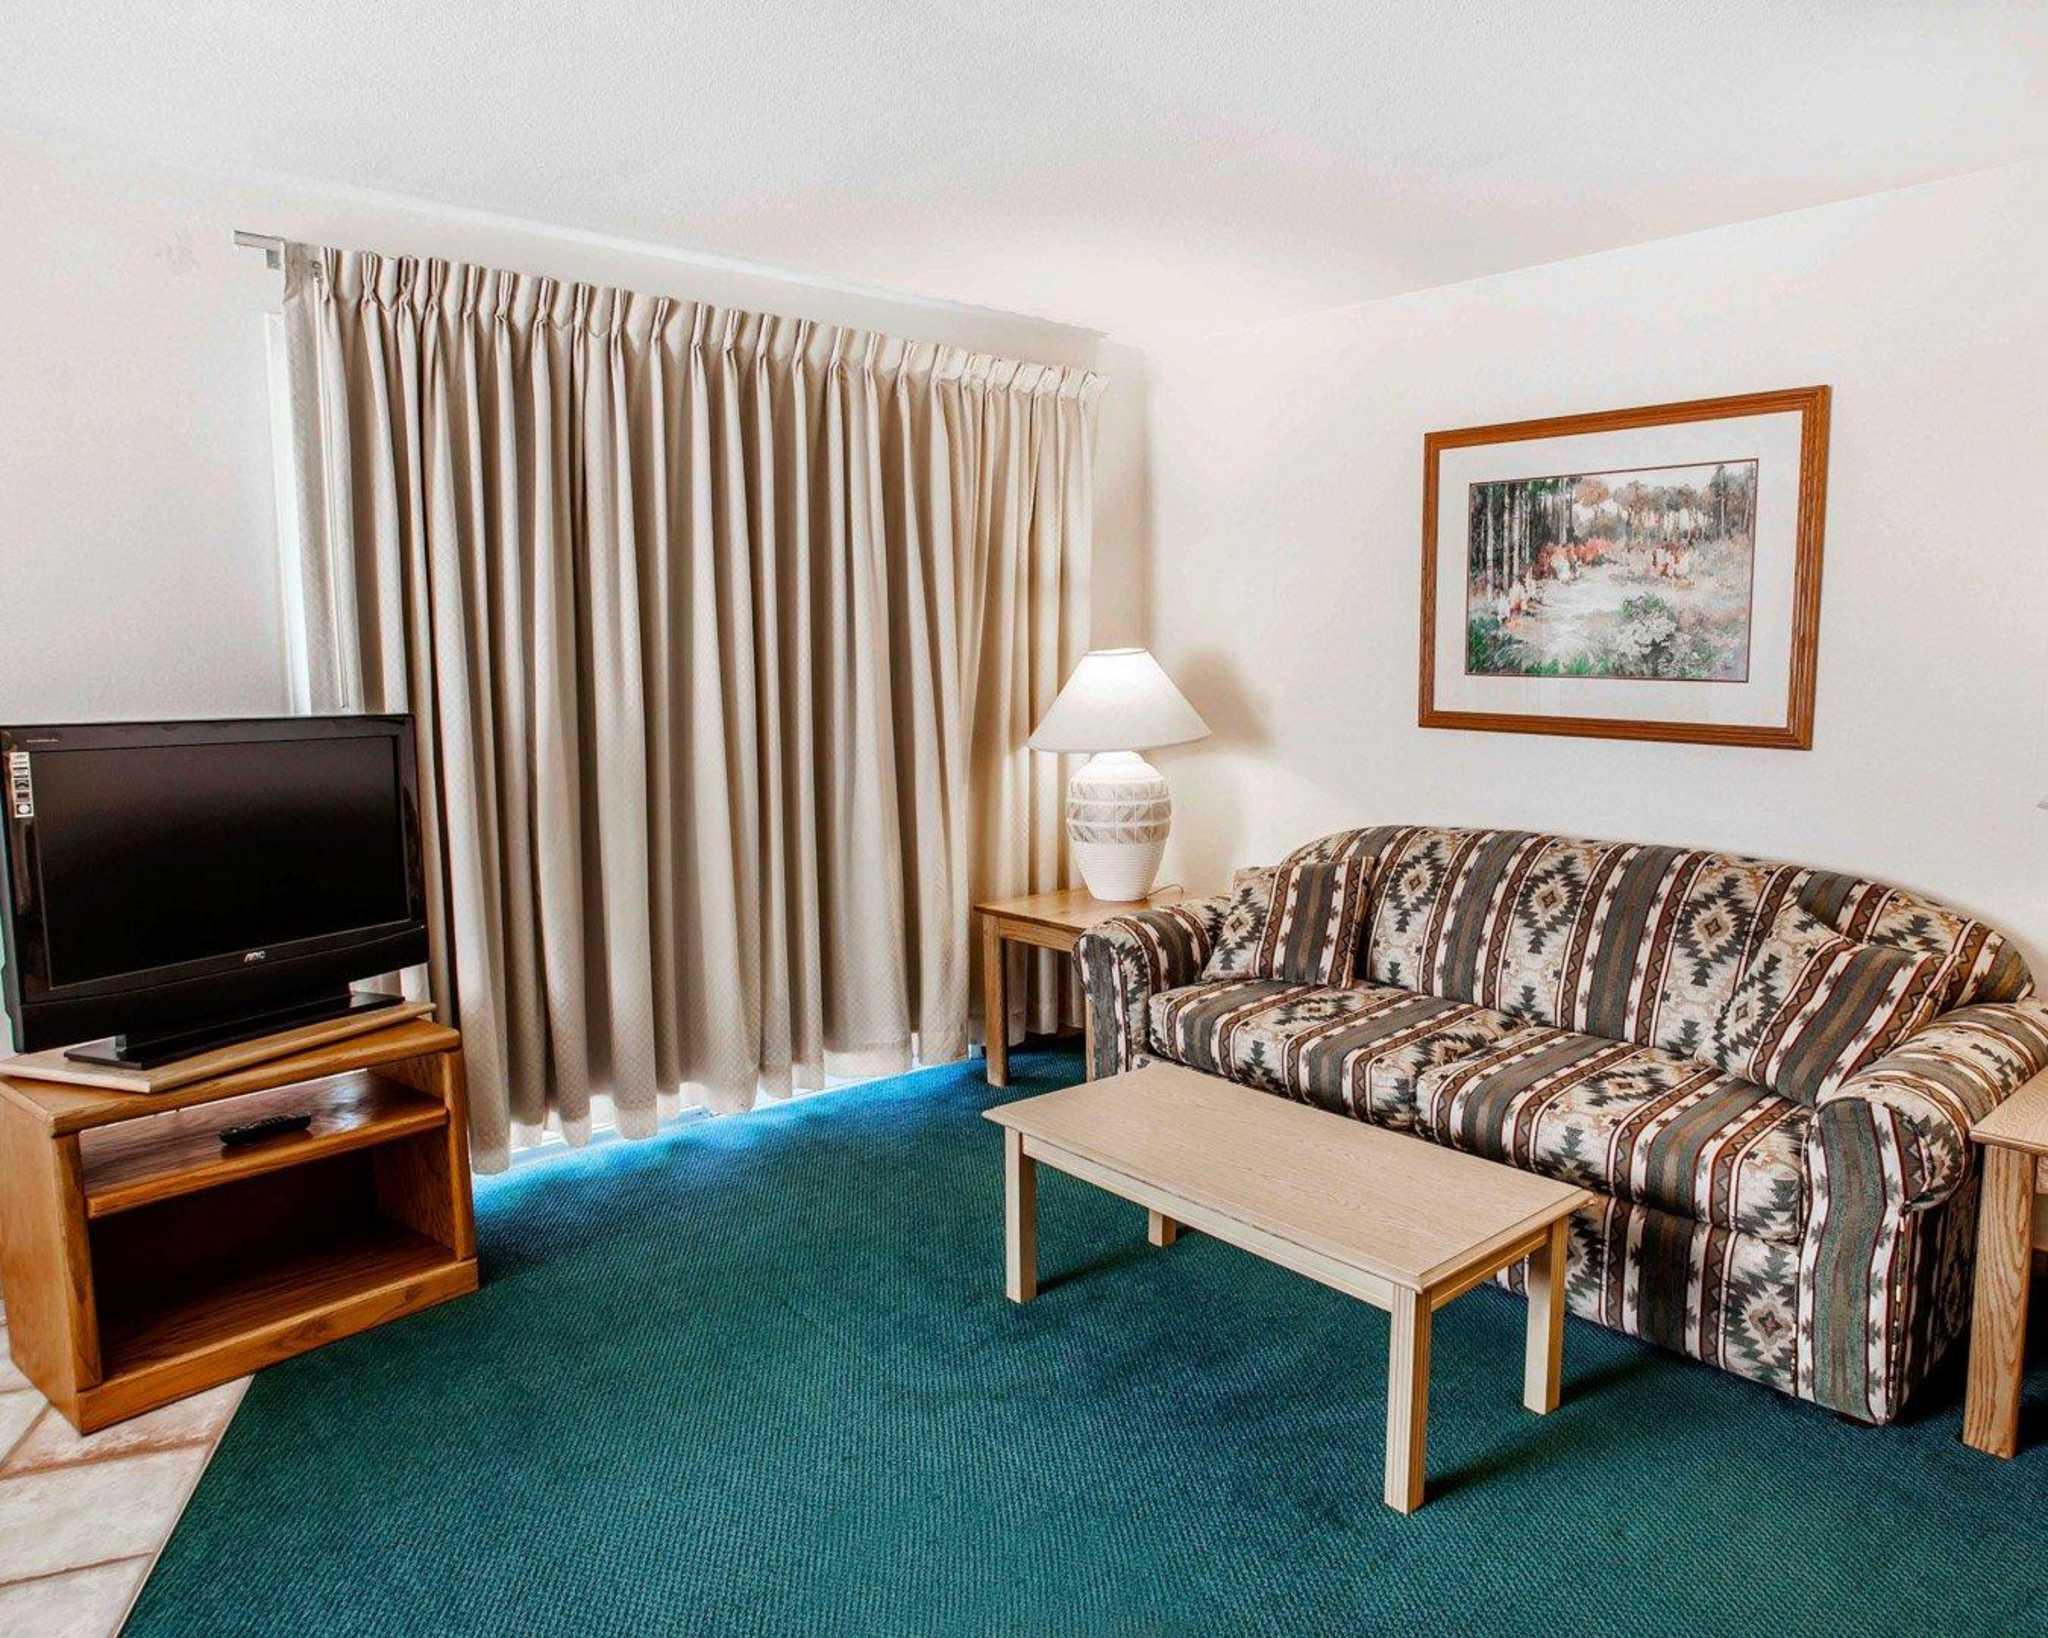 Quality Inn & Suites image 37